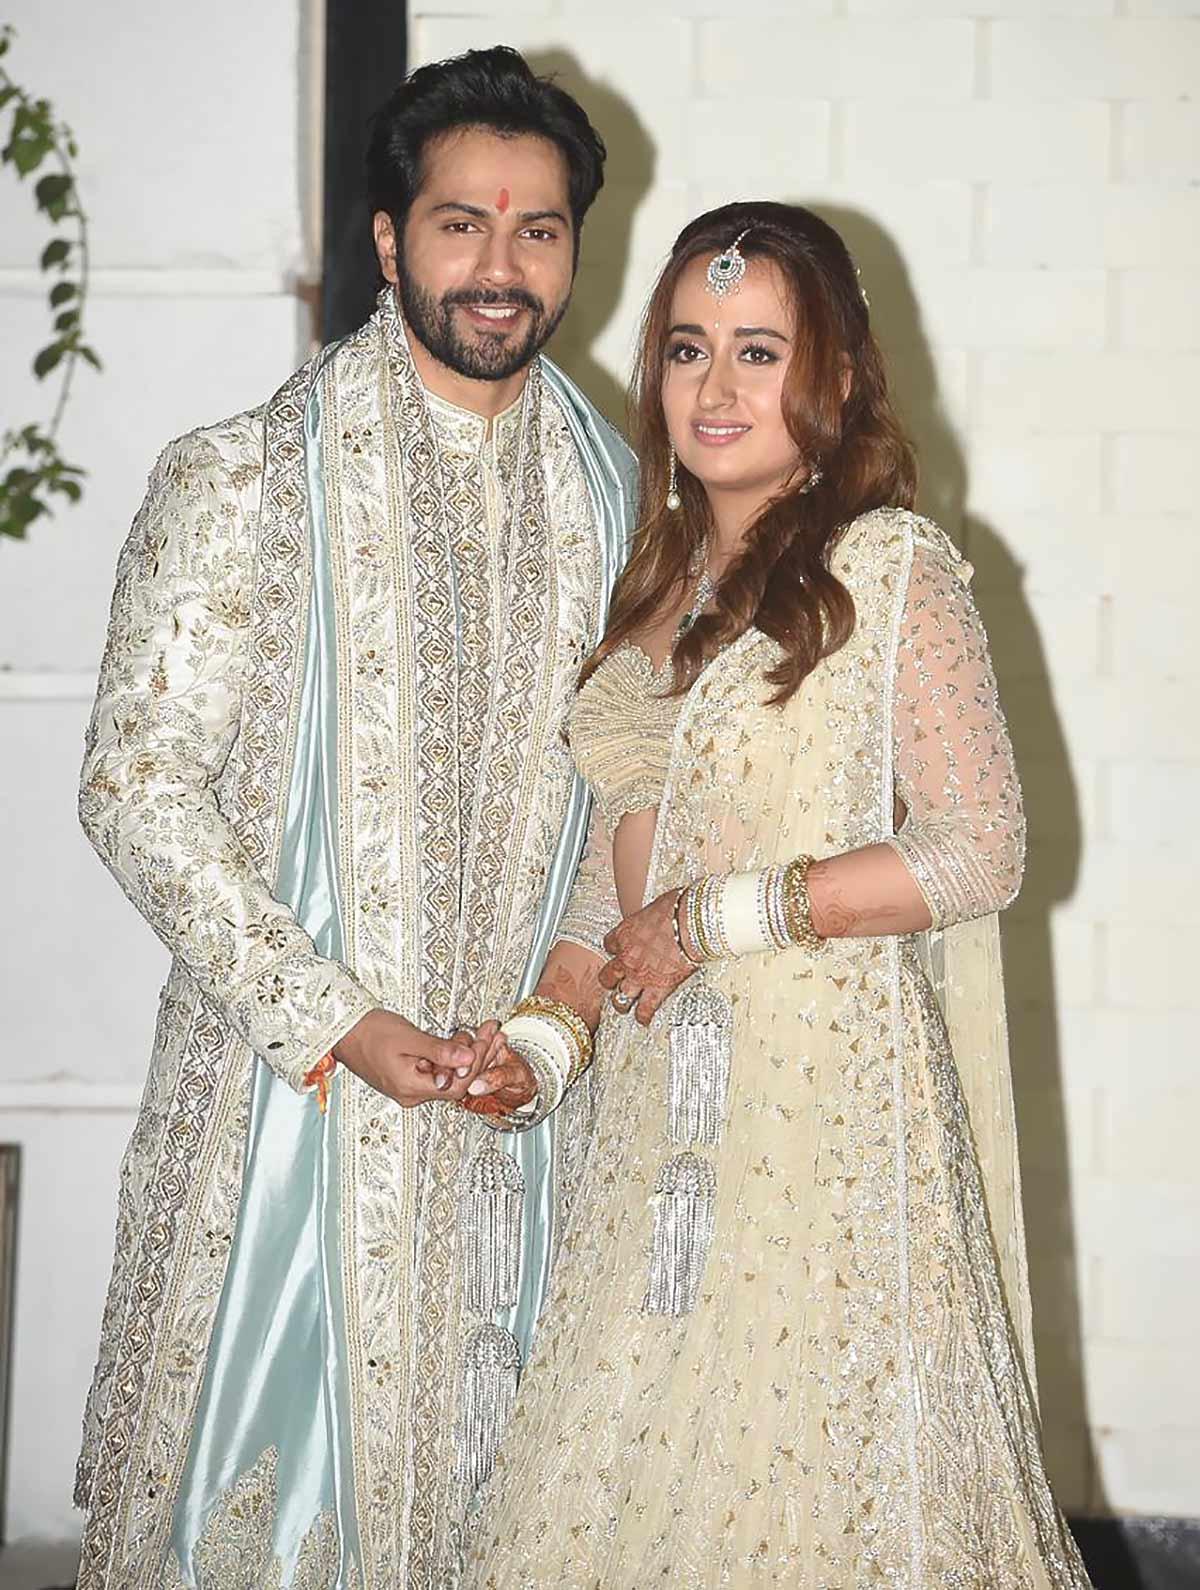 Who designed Varun's wedding look?